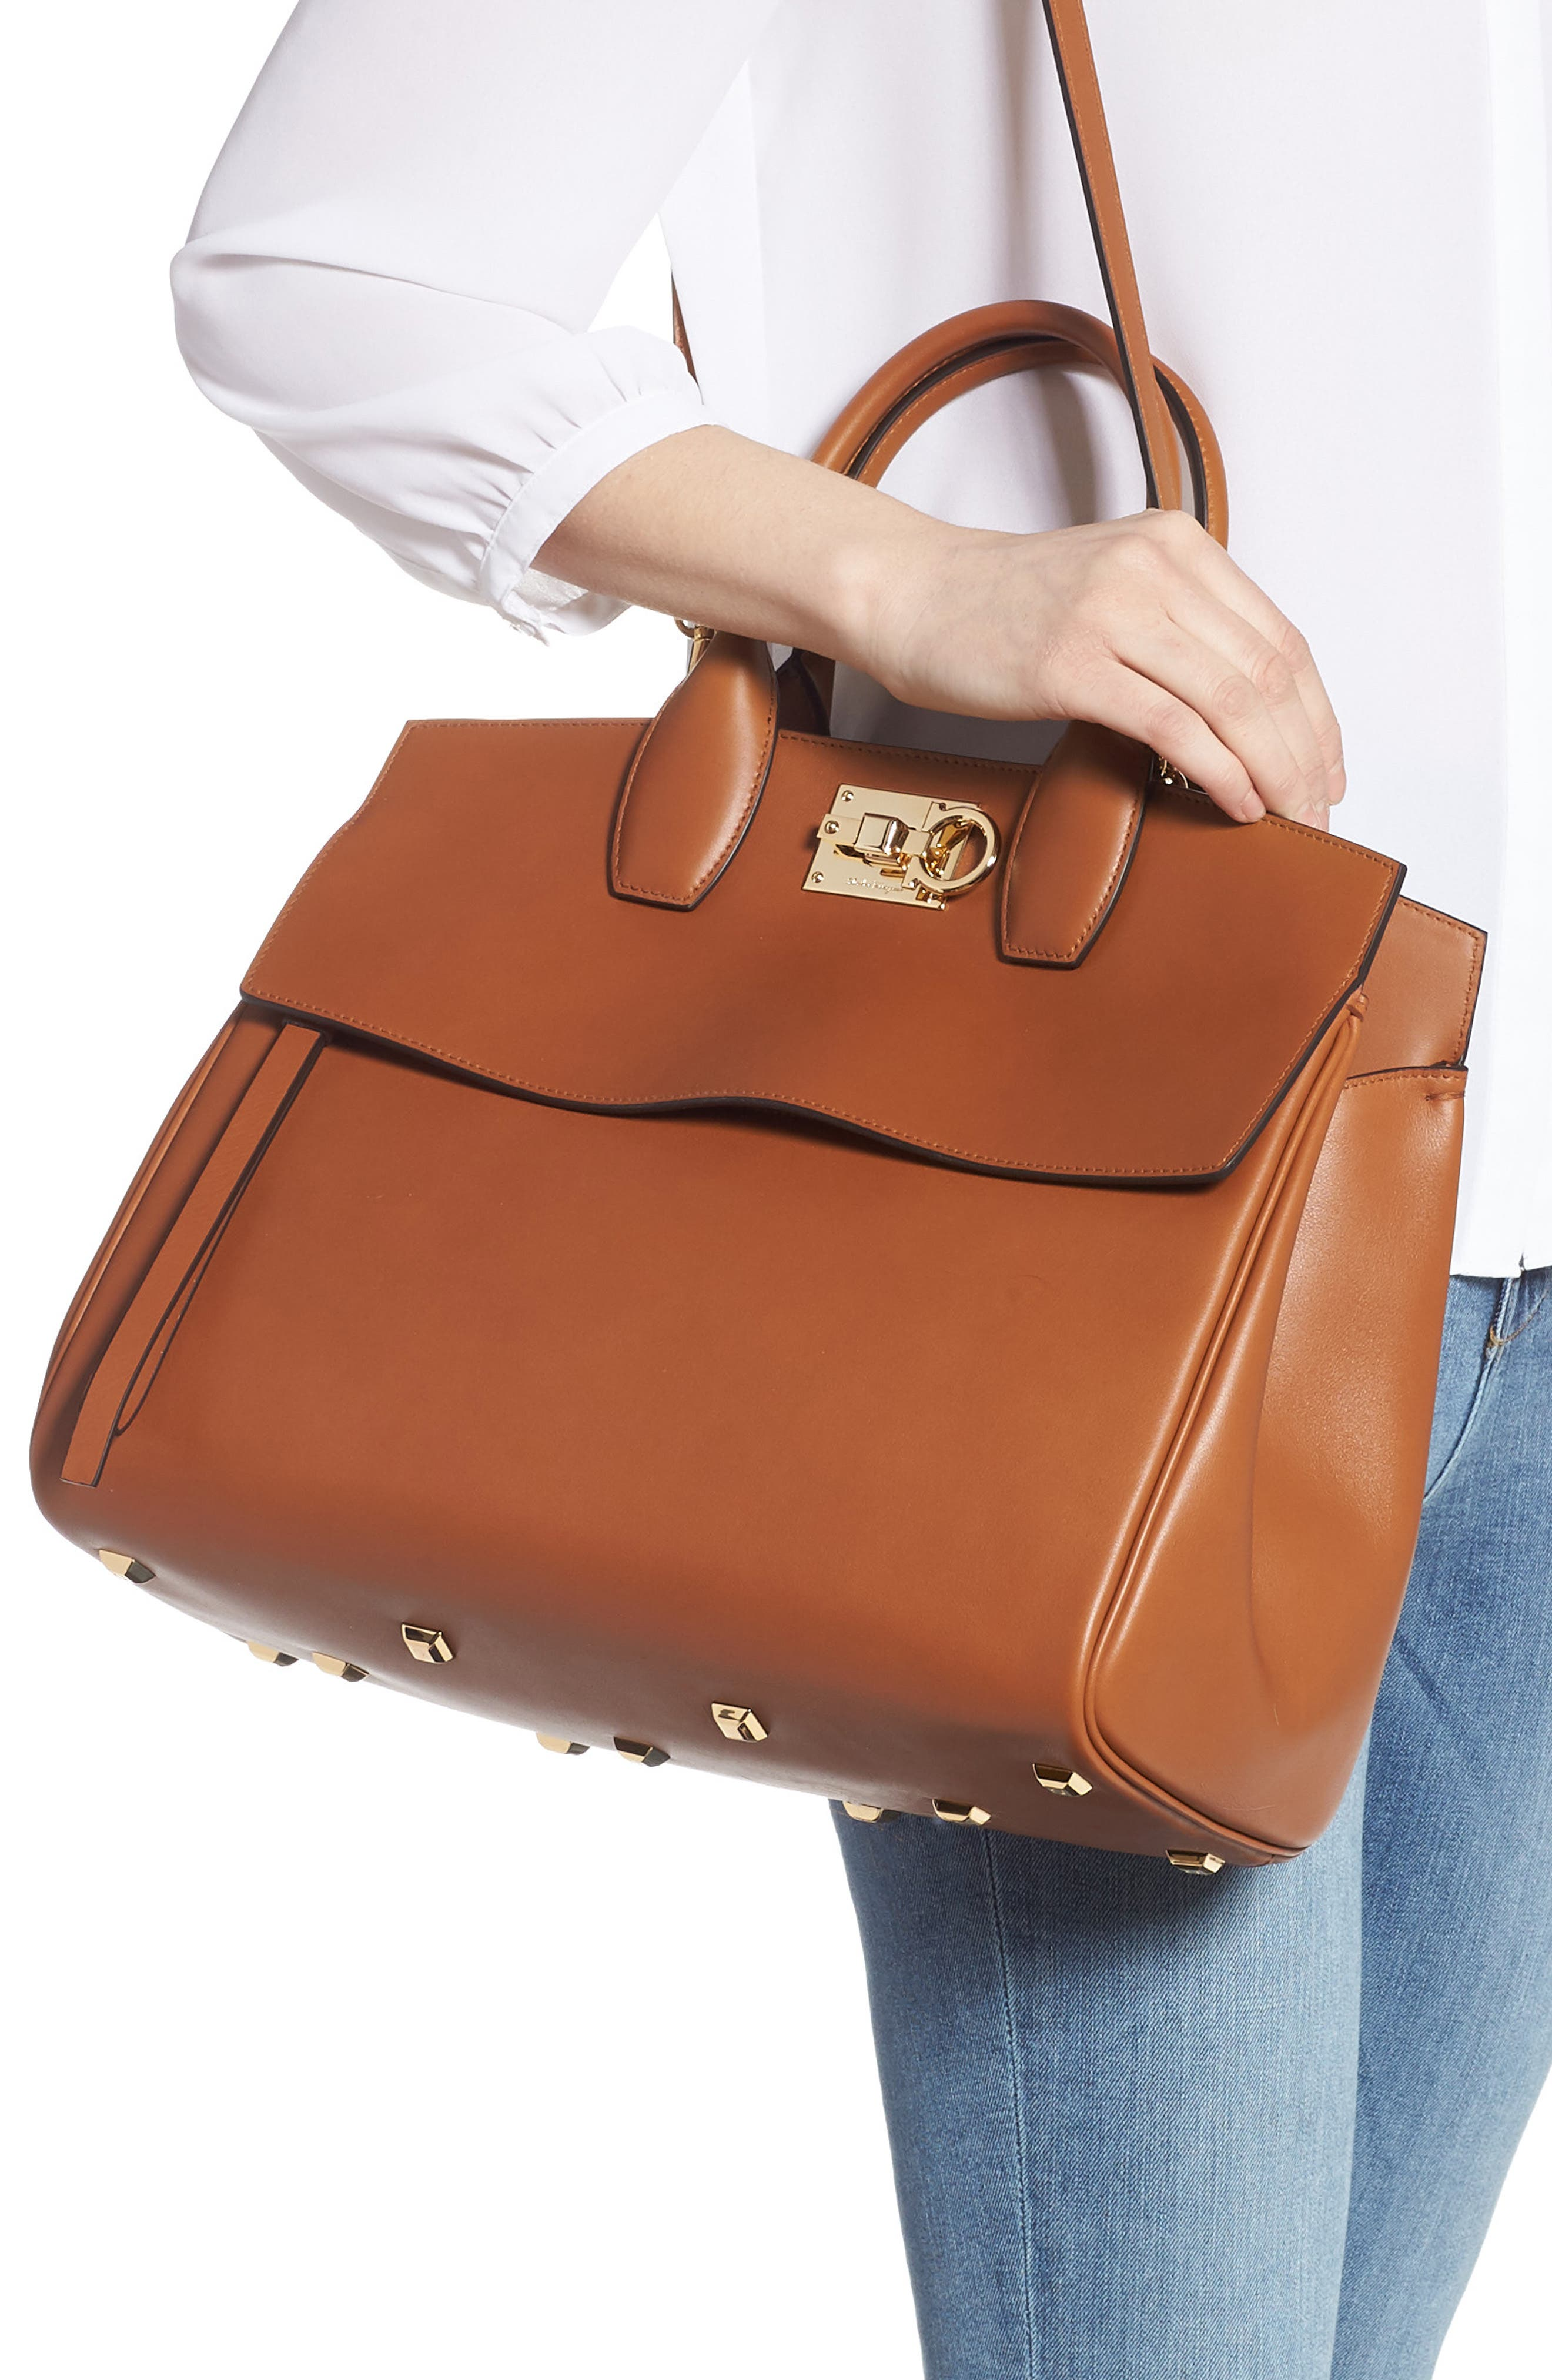 SALVATORE FERRAGAMO, Medium The Studio Calfskin Leather Top Handle Bag, Alternate thumbnail 2, color, SELLA